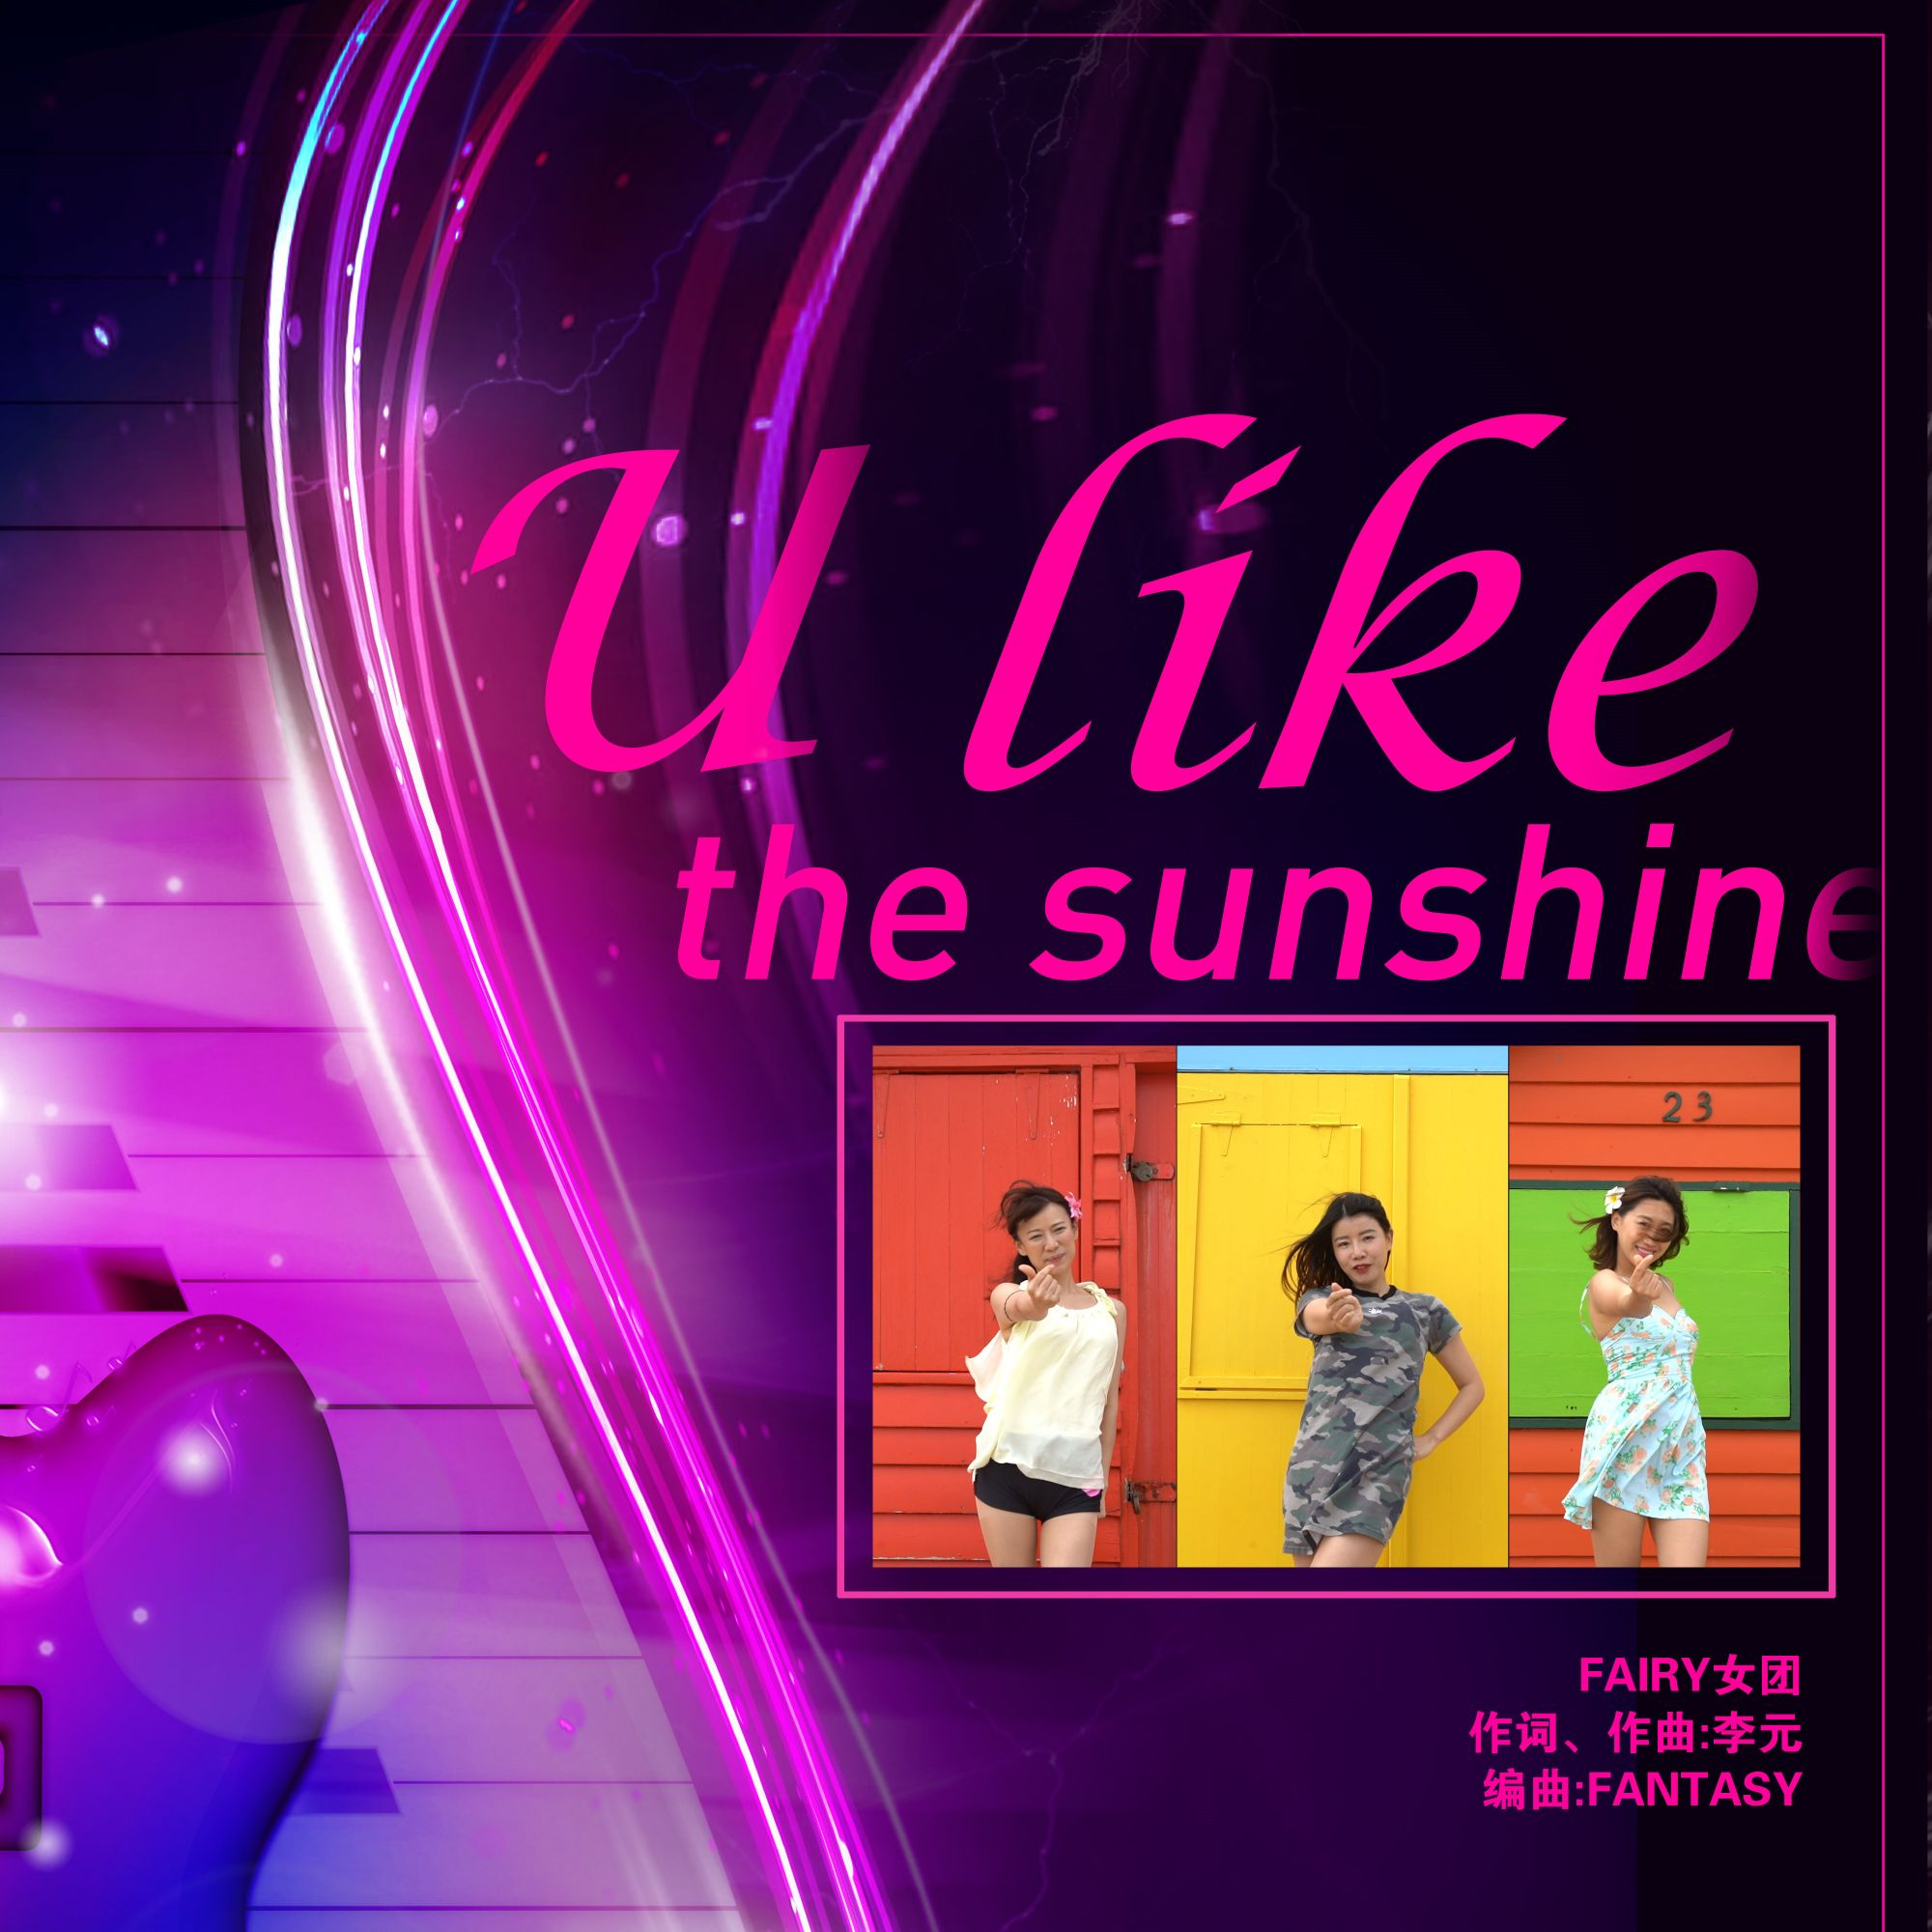 Fairy女团《 U like the sunshine》MV首发 靓丽身形舞动青春